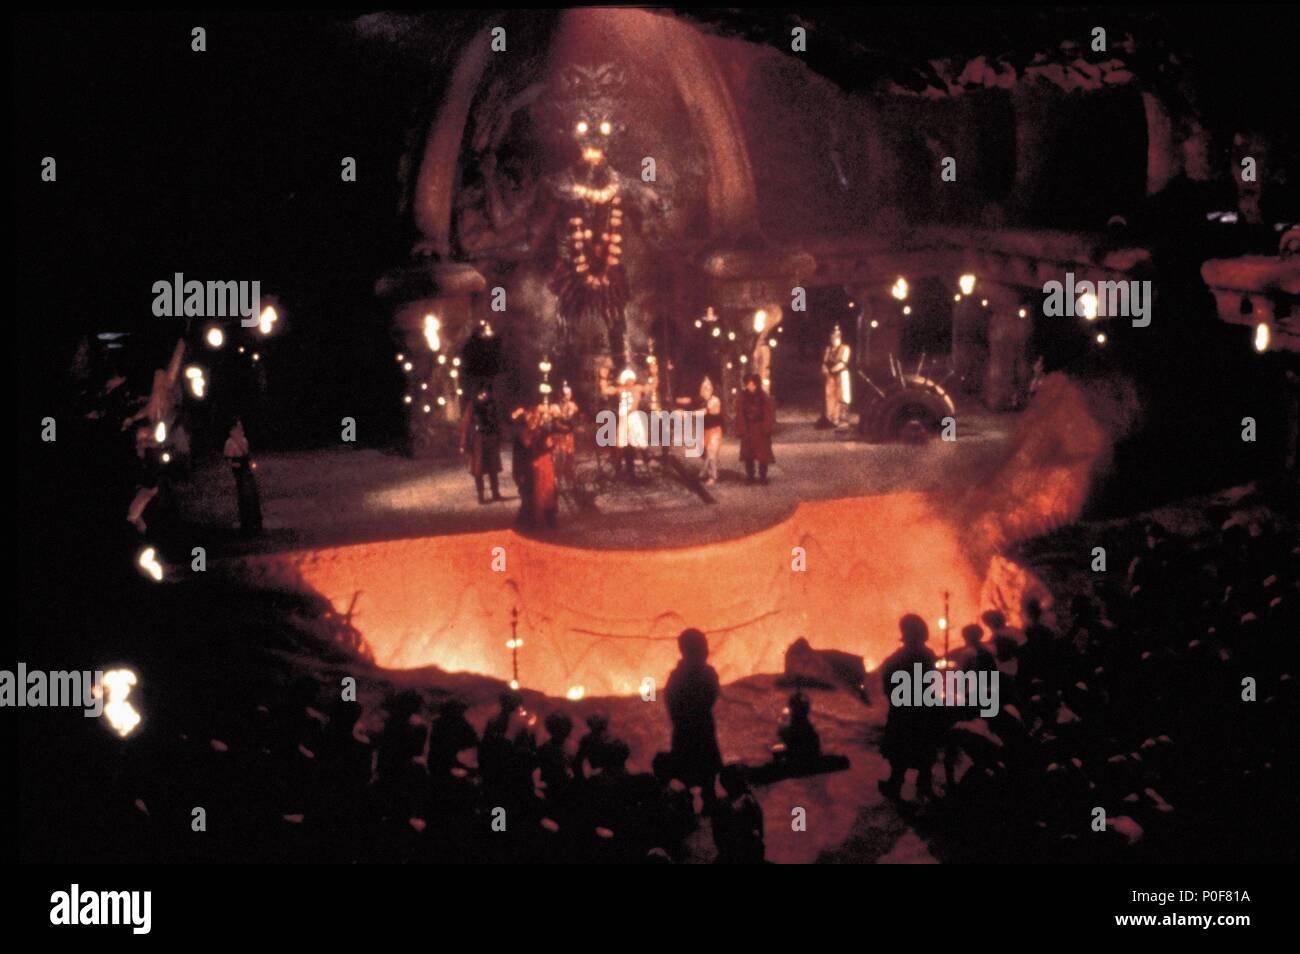 Indiana Jones And The Temple Of Doom Stock Photos & Indiana